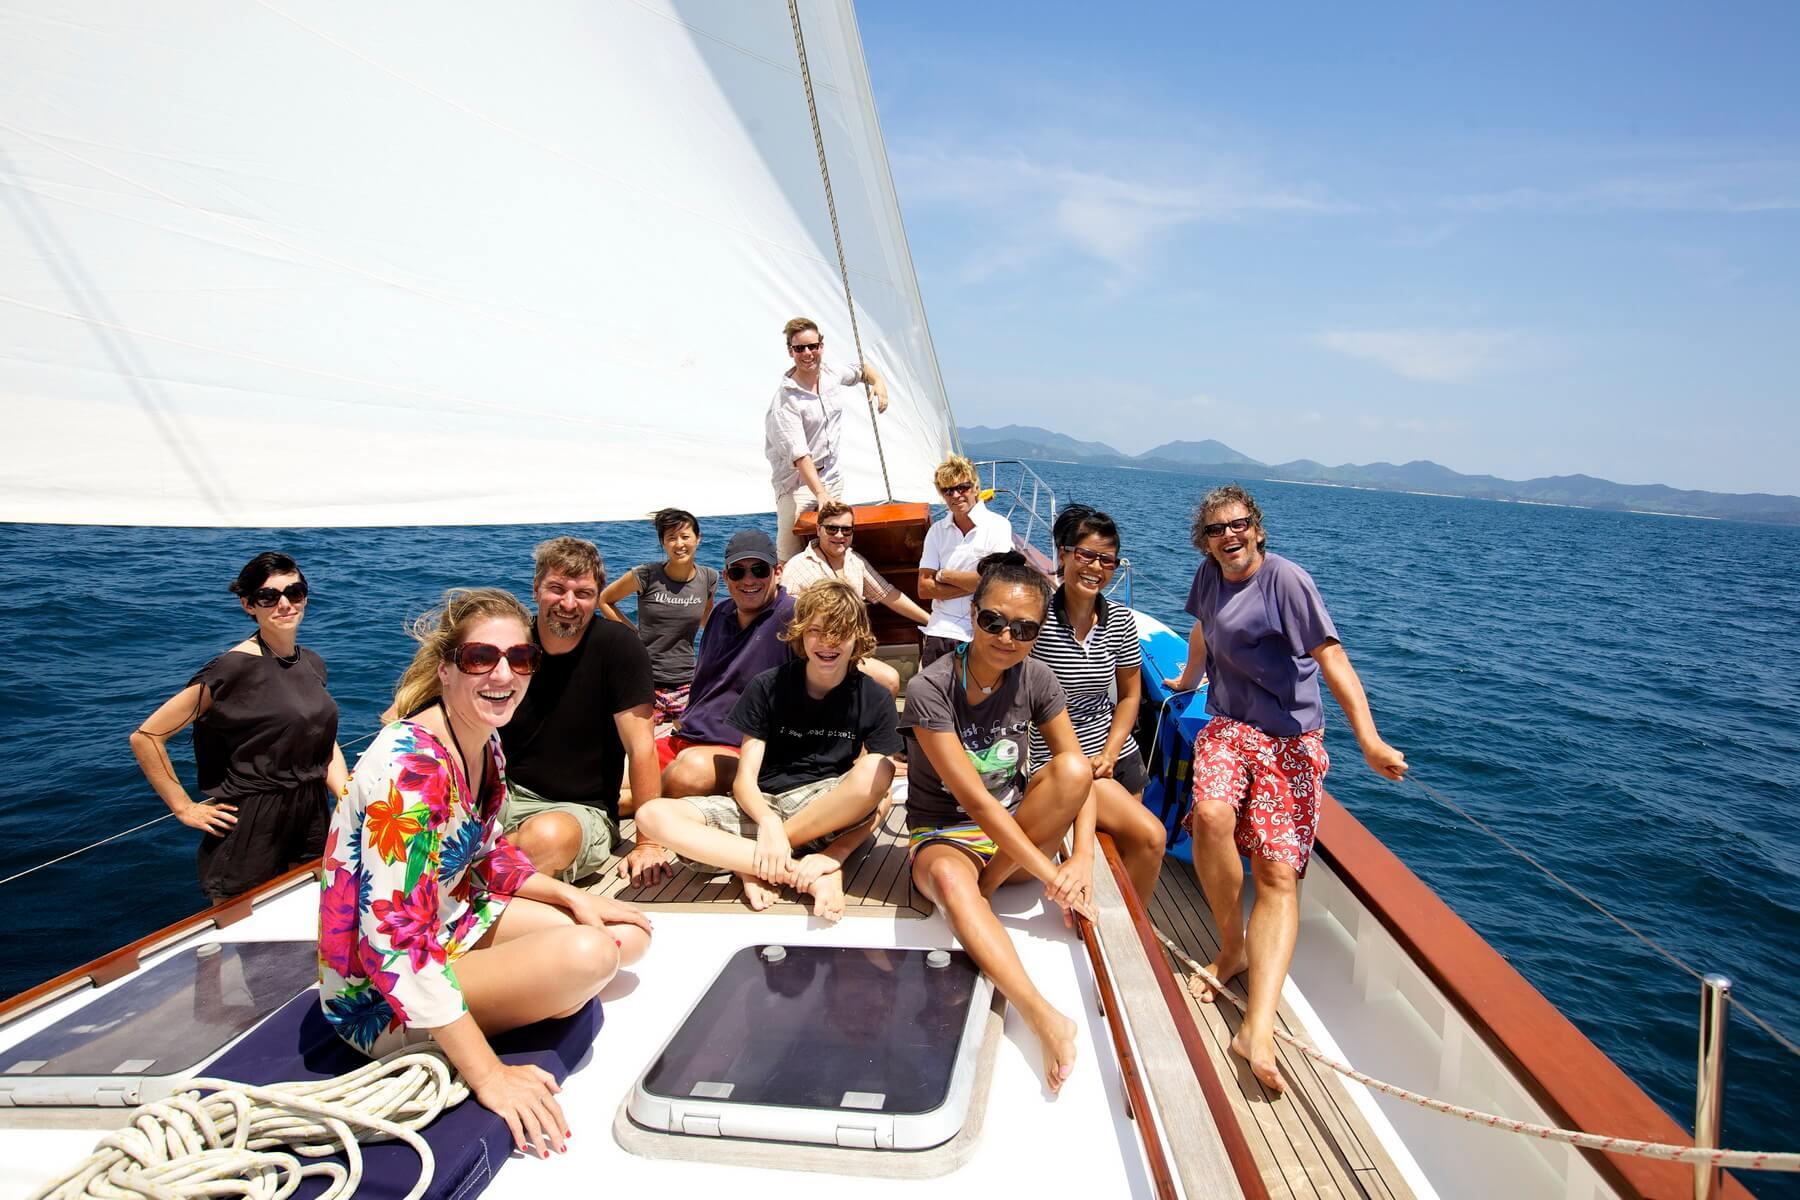 Touristen auf dem Segelboot Meta IV.